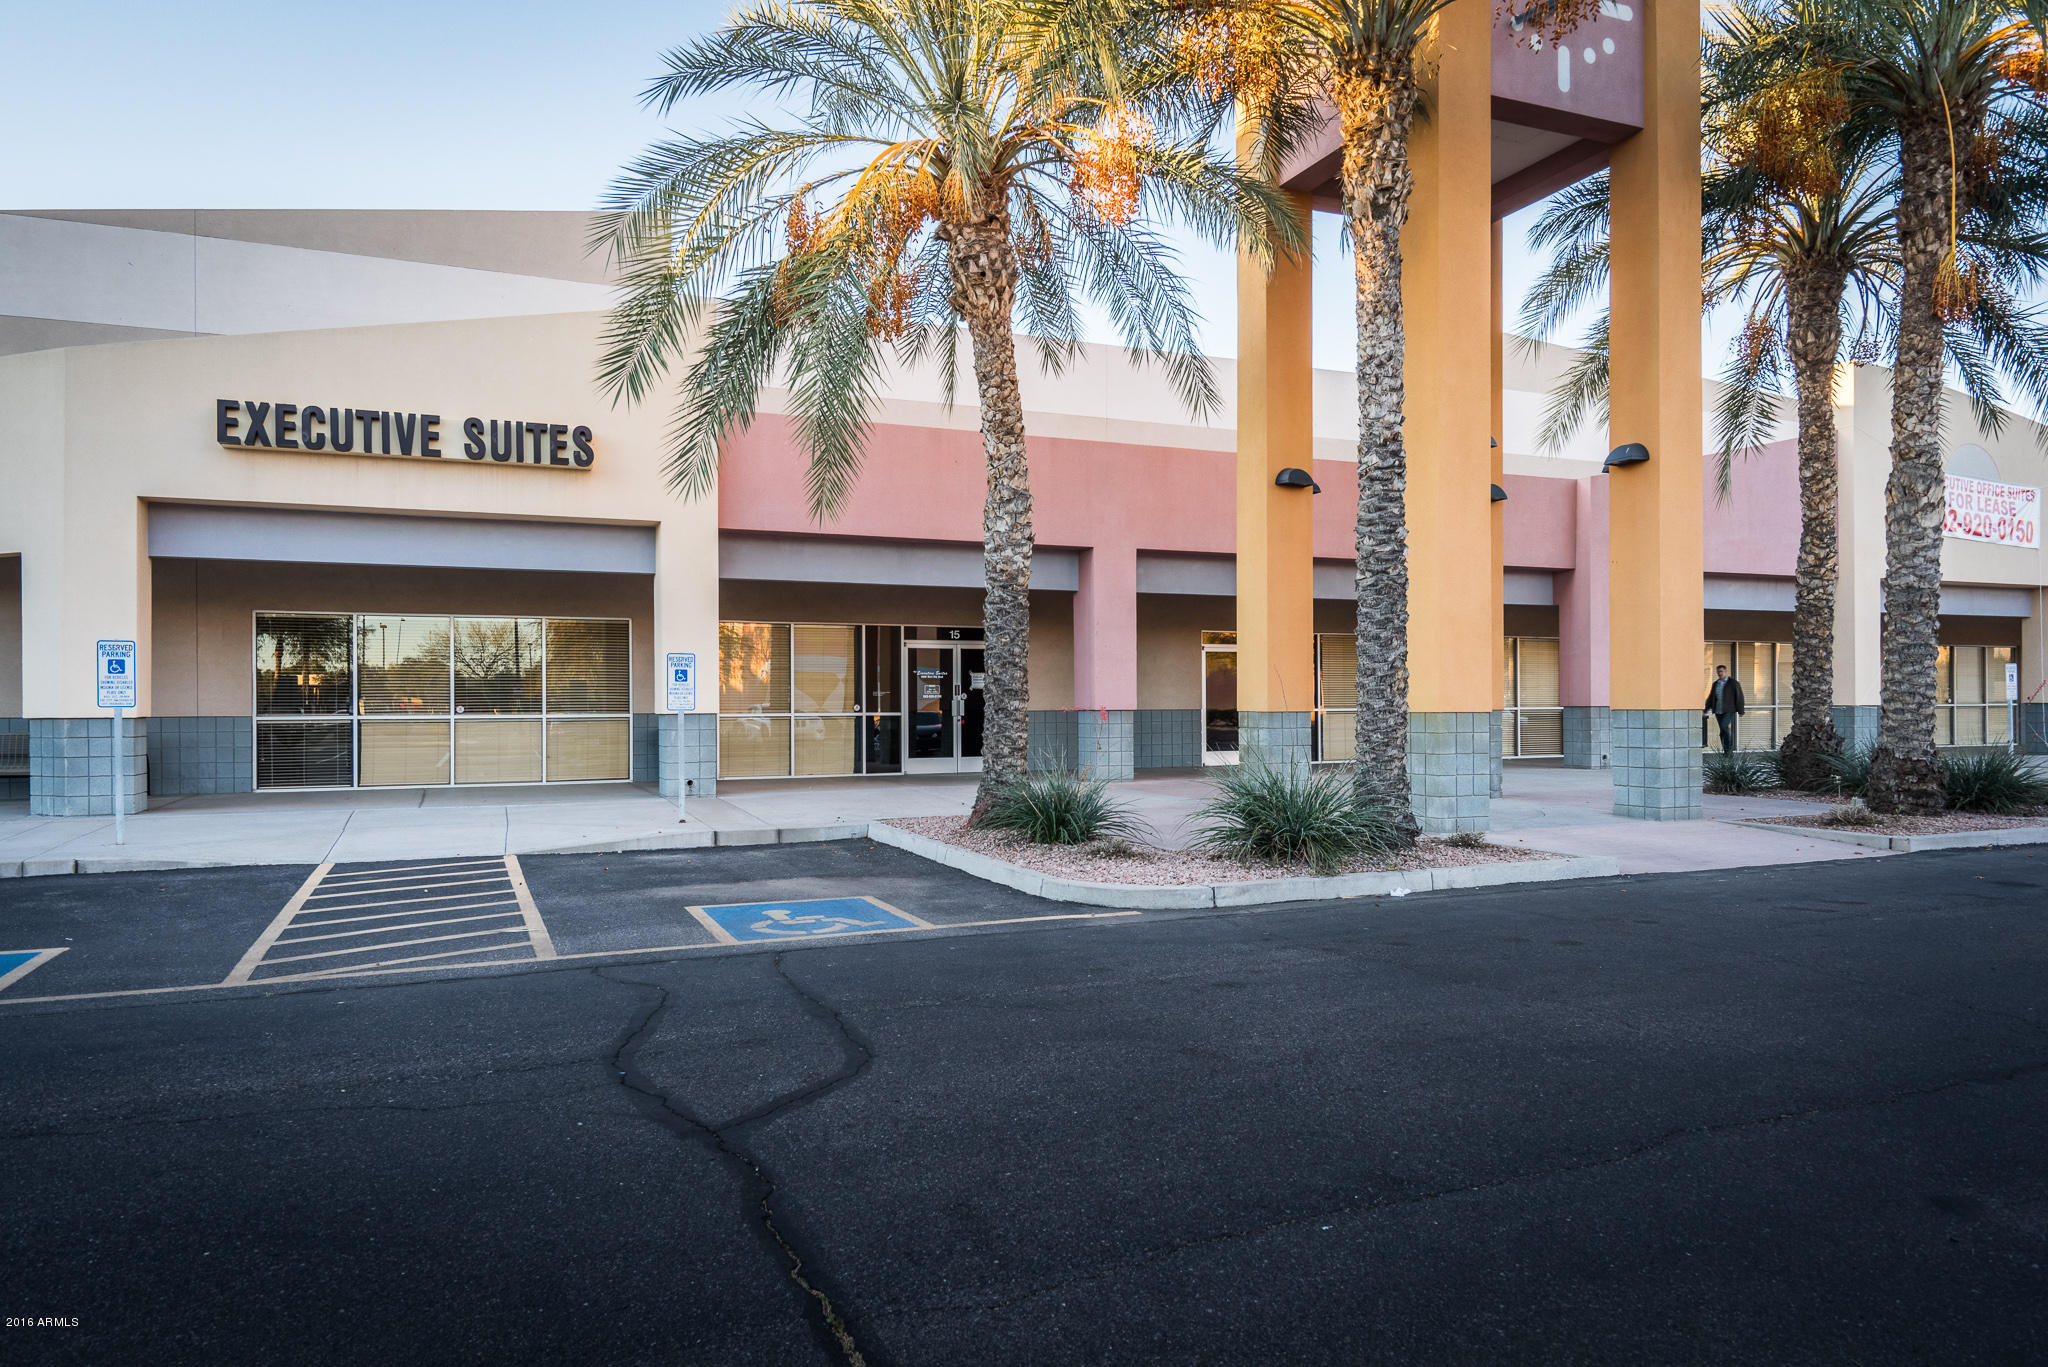 6909 W Ray Road, Unit 15, Chandler AZ 85226 - Photo 2